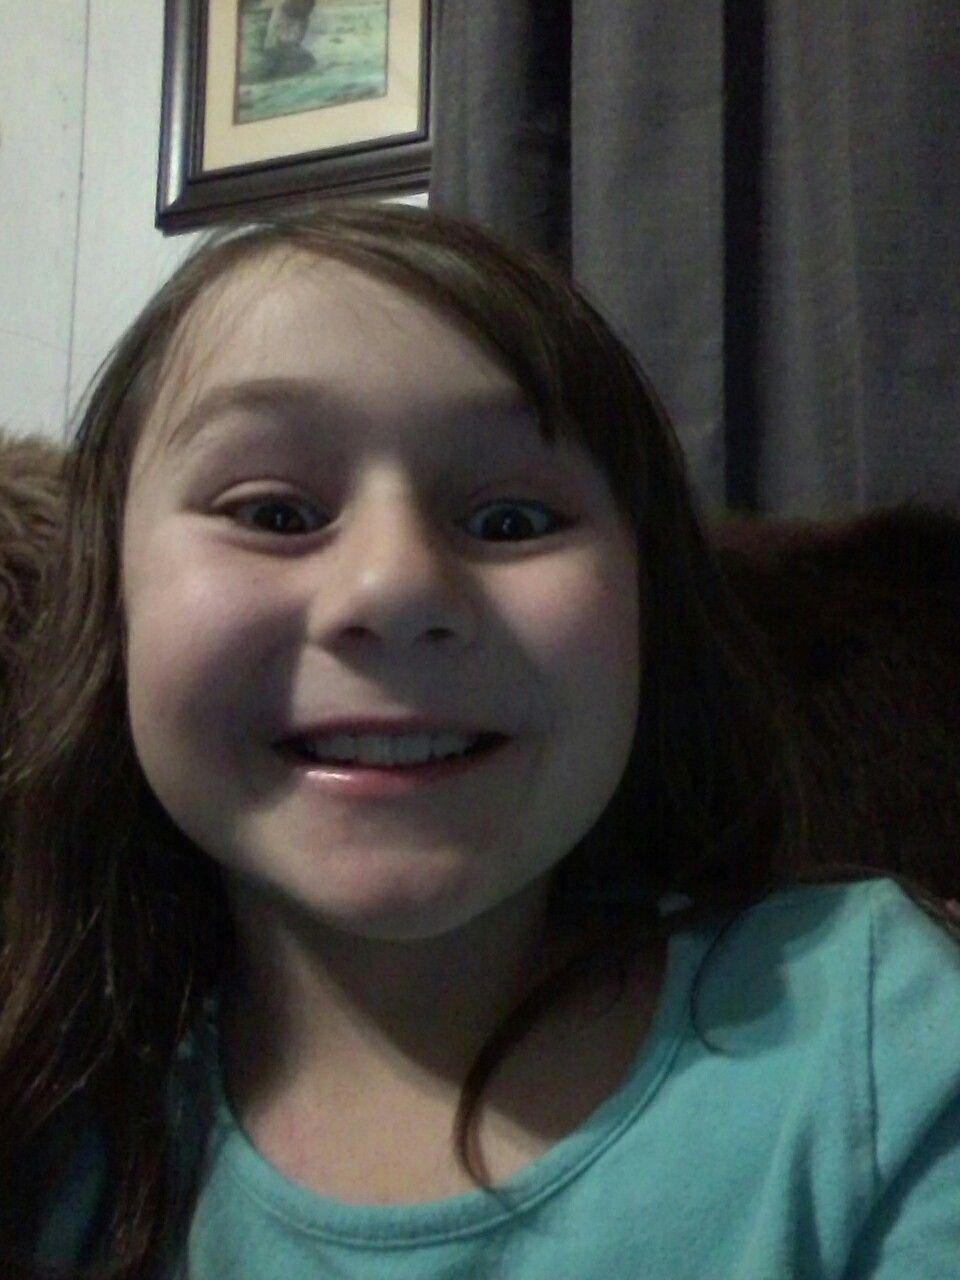 Biggest Smiles Calis World Pinterest